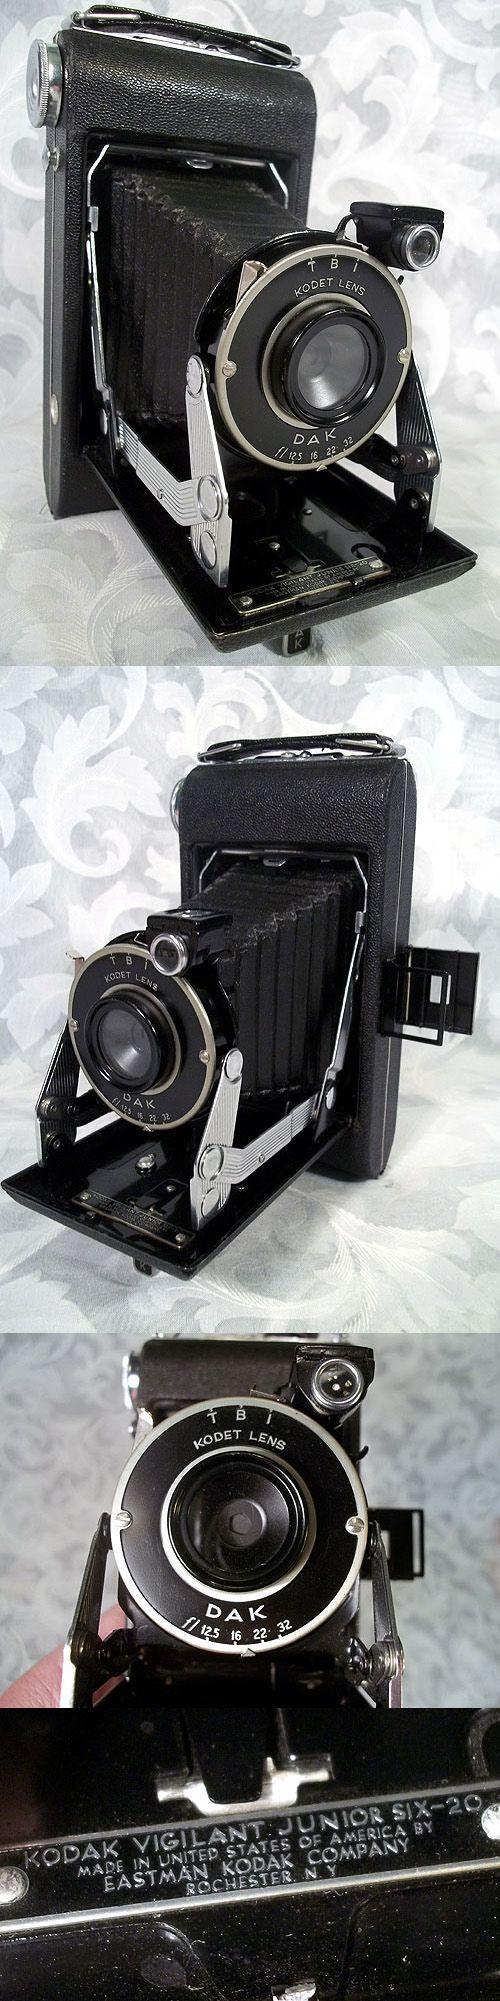 $120.00 or best offer Vintage 1940's KODAK DAK VIGILANT JUNIOR SIX-20 Folding Camera Made in USA